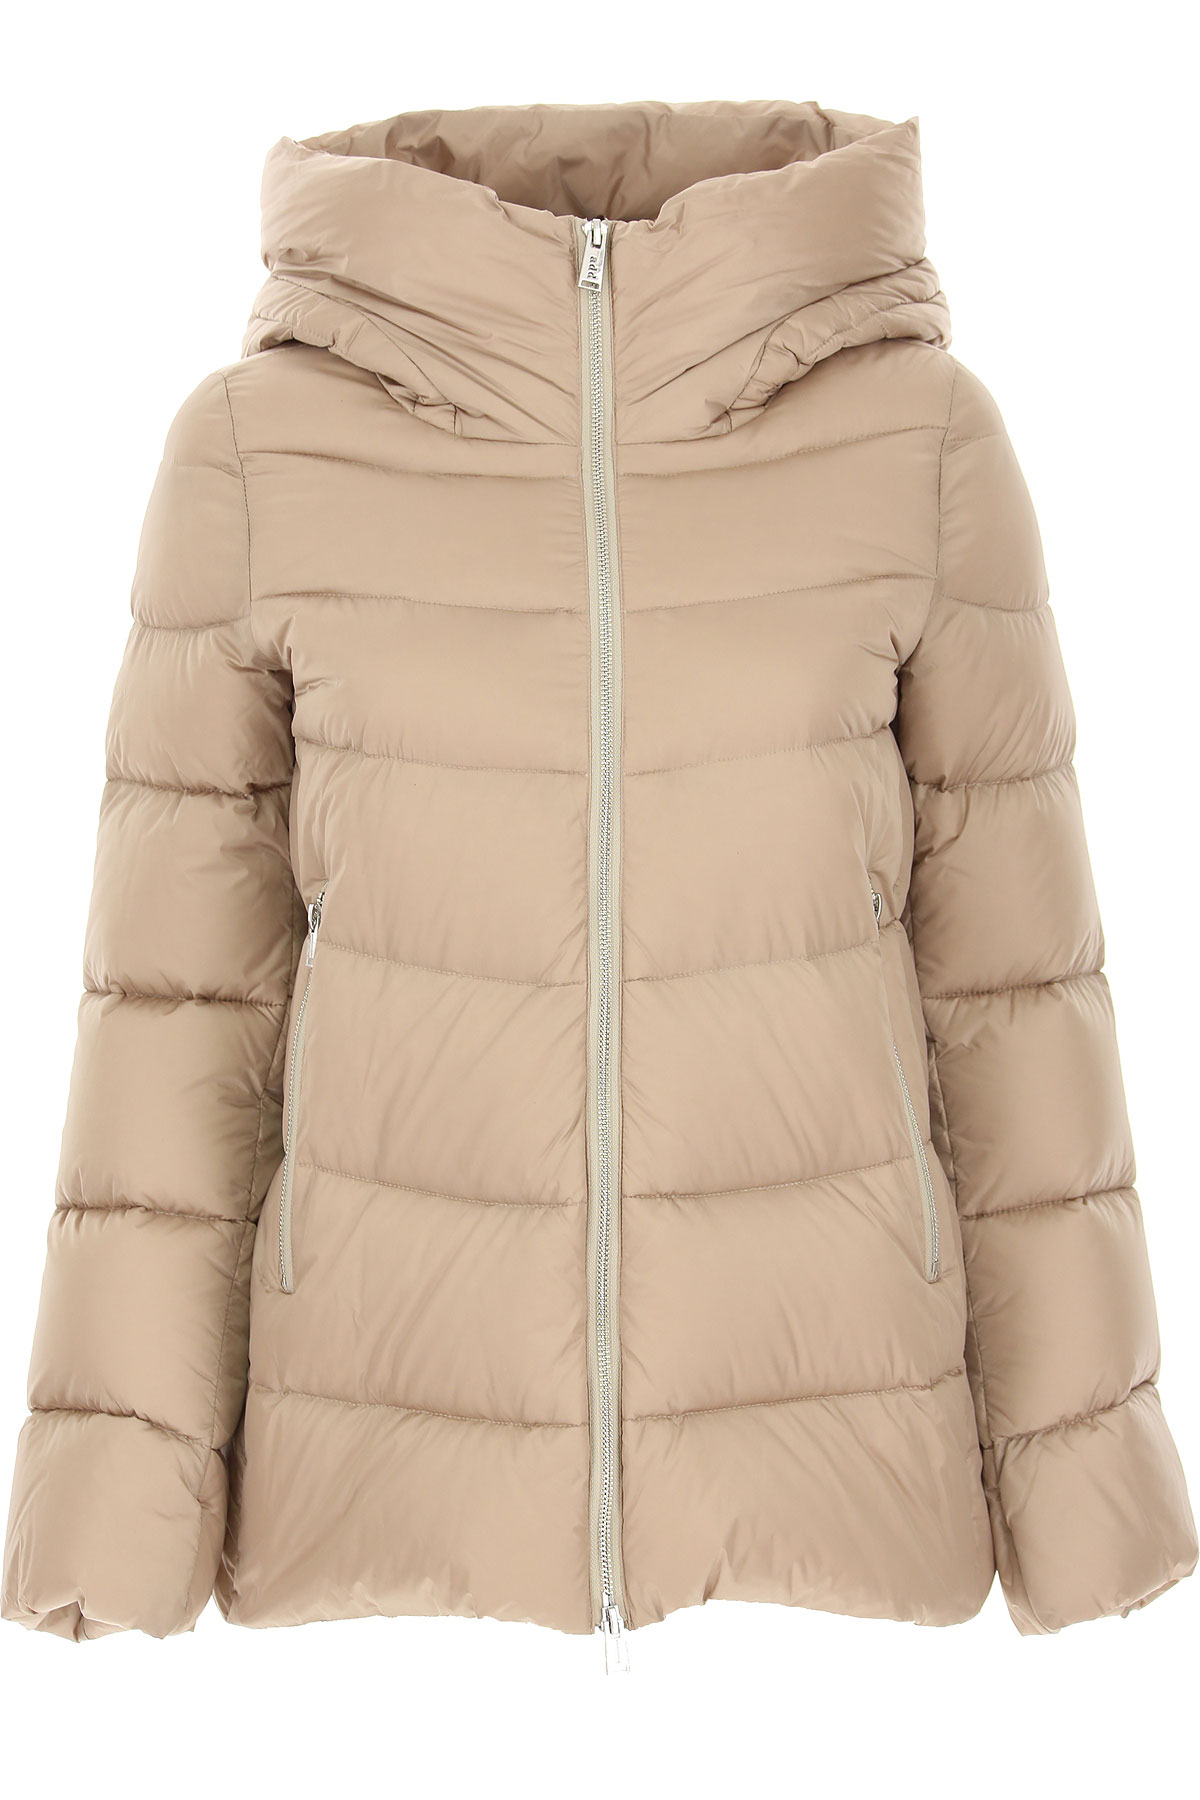 ADD Down Jacket for Women, Puffer Ski Jacket, Beige, polyamide, 2019, 4 6 8